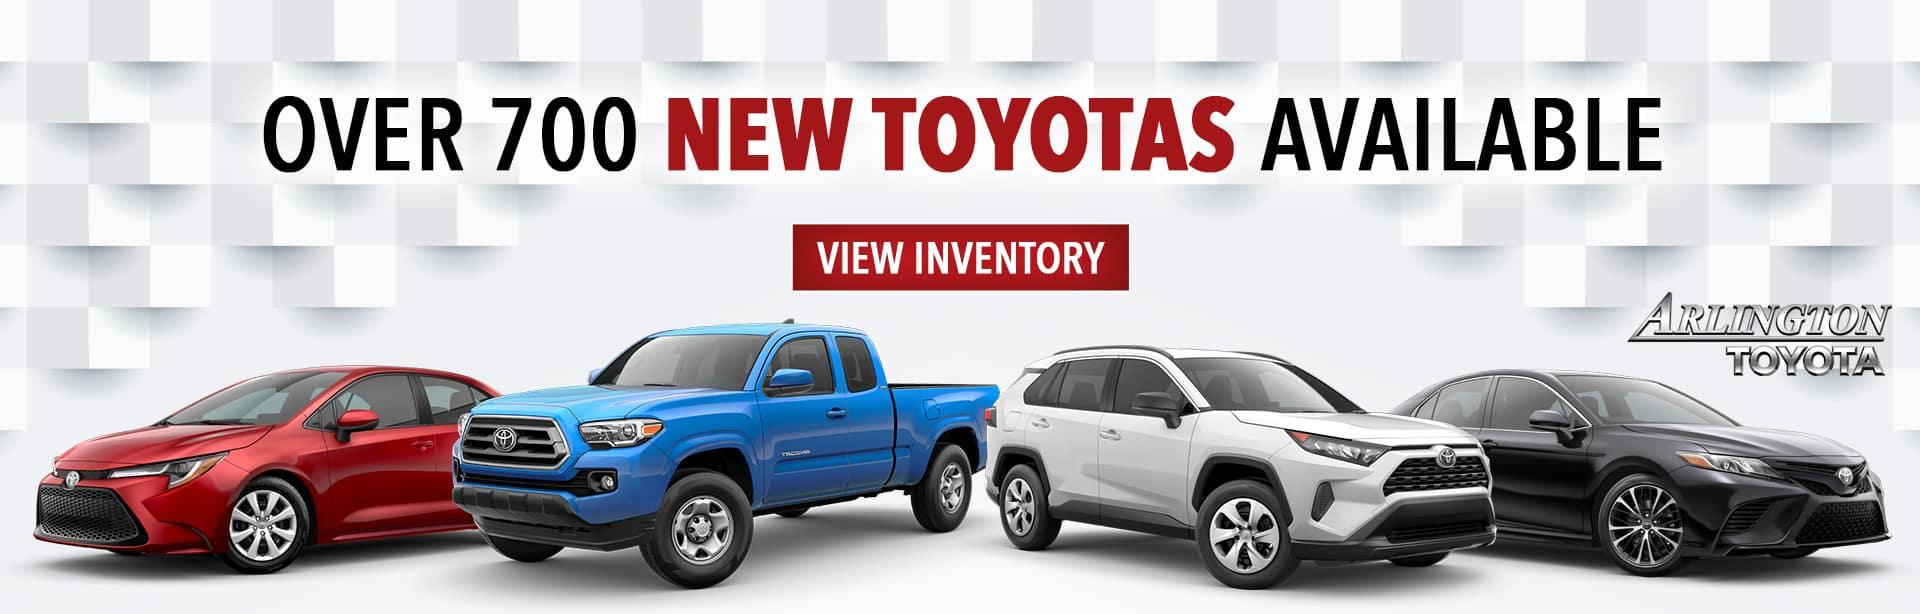 Arlington Toyota 700 Vehicles  On The Lot